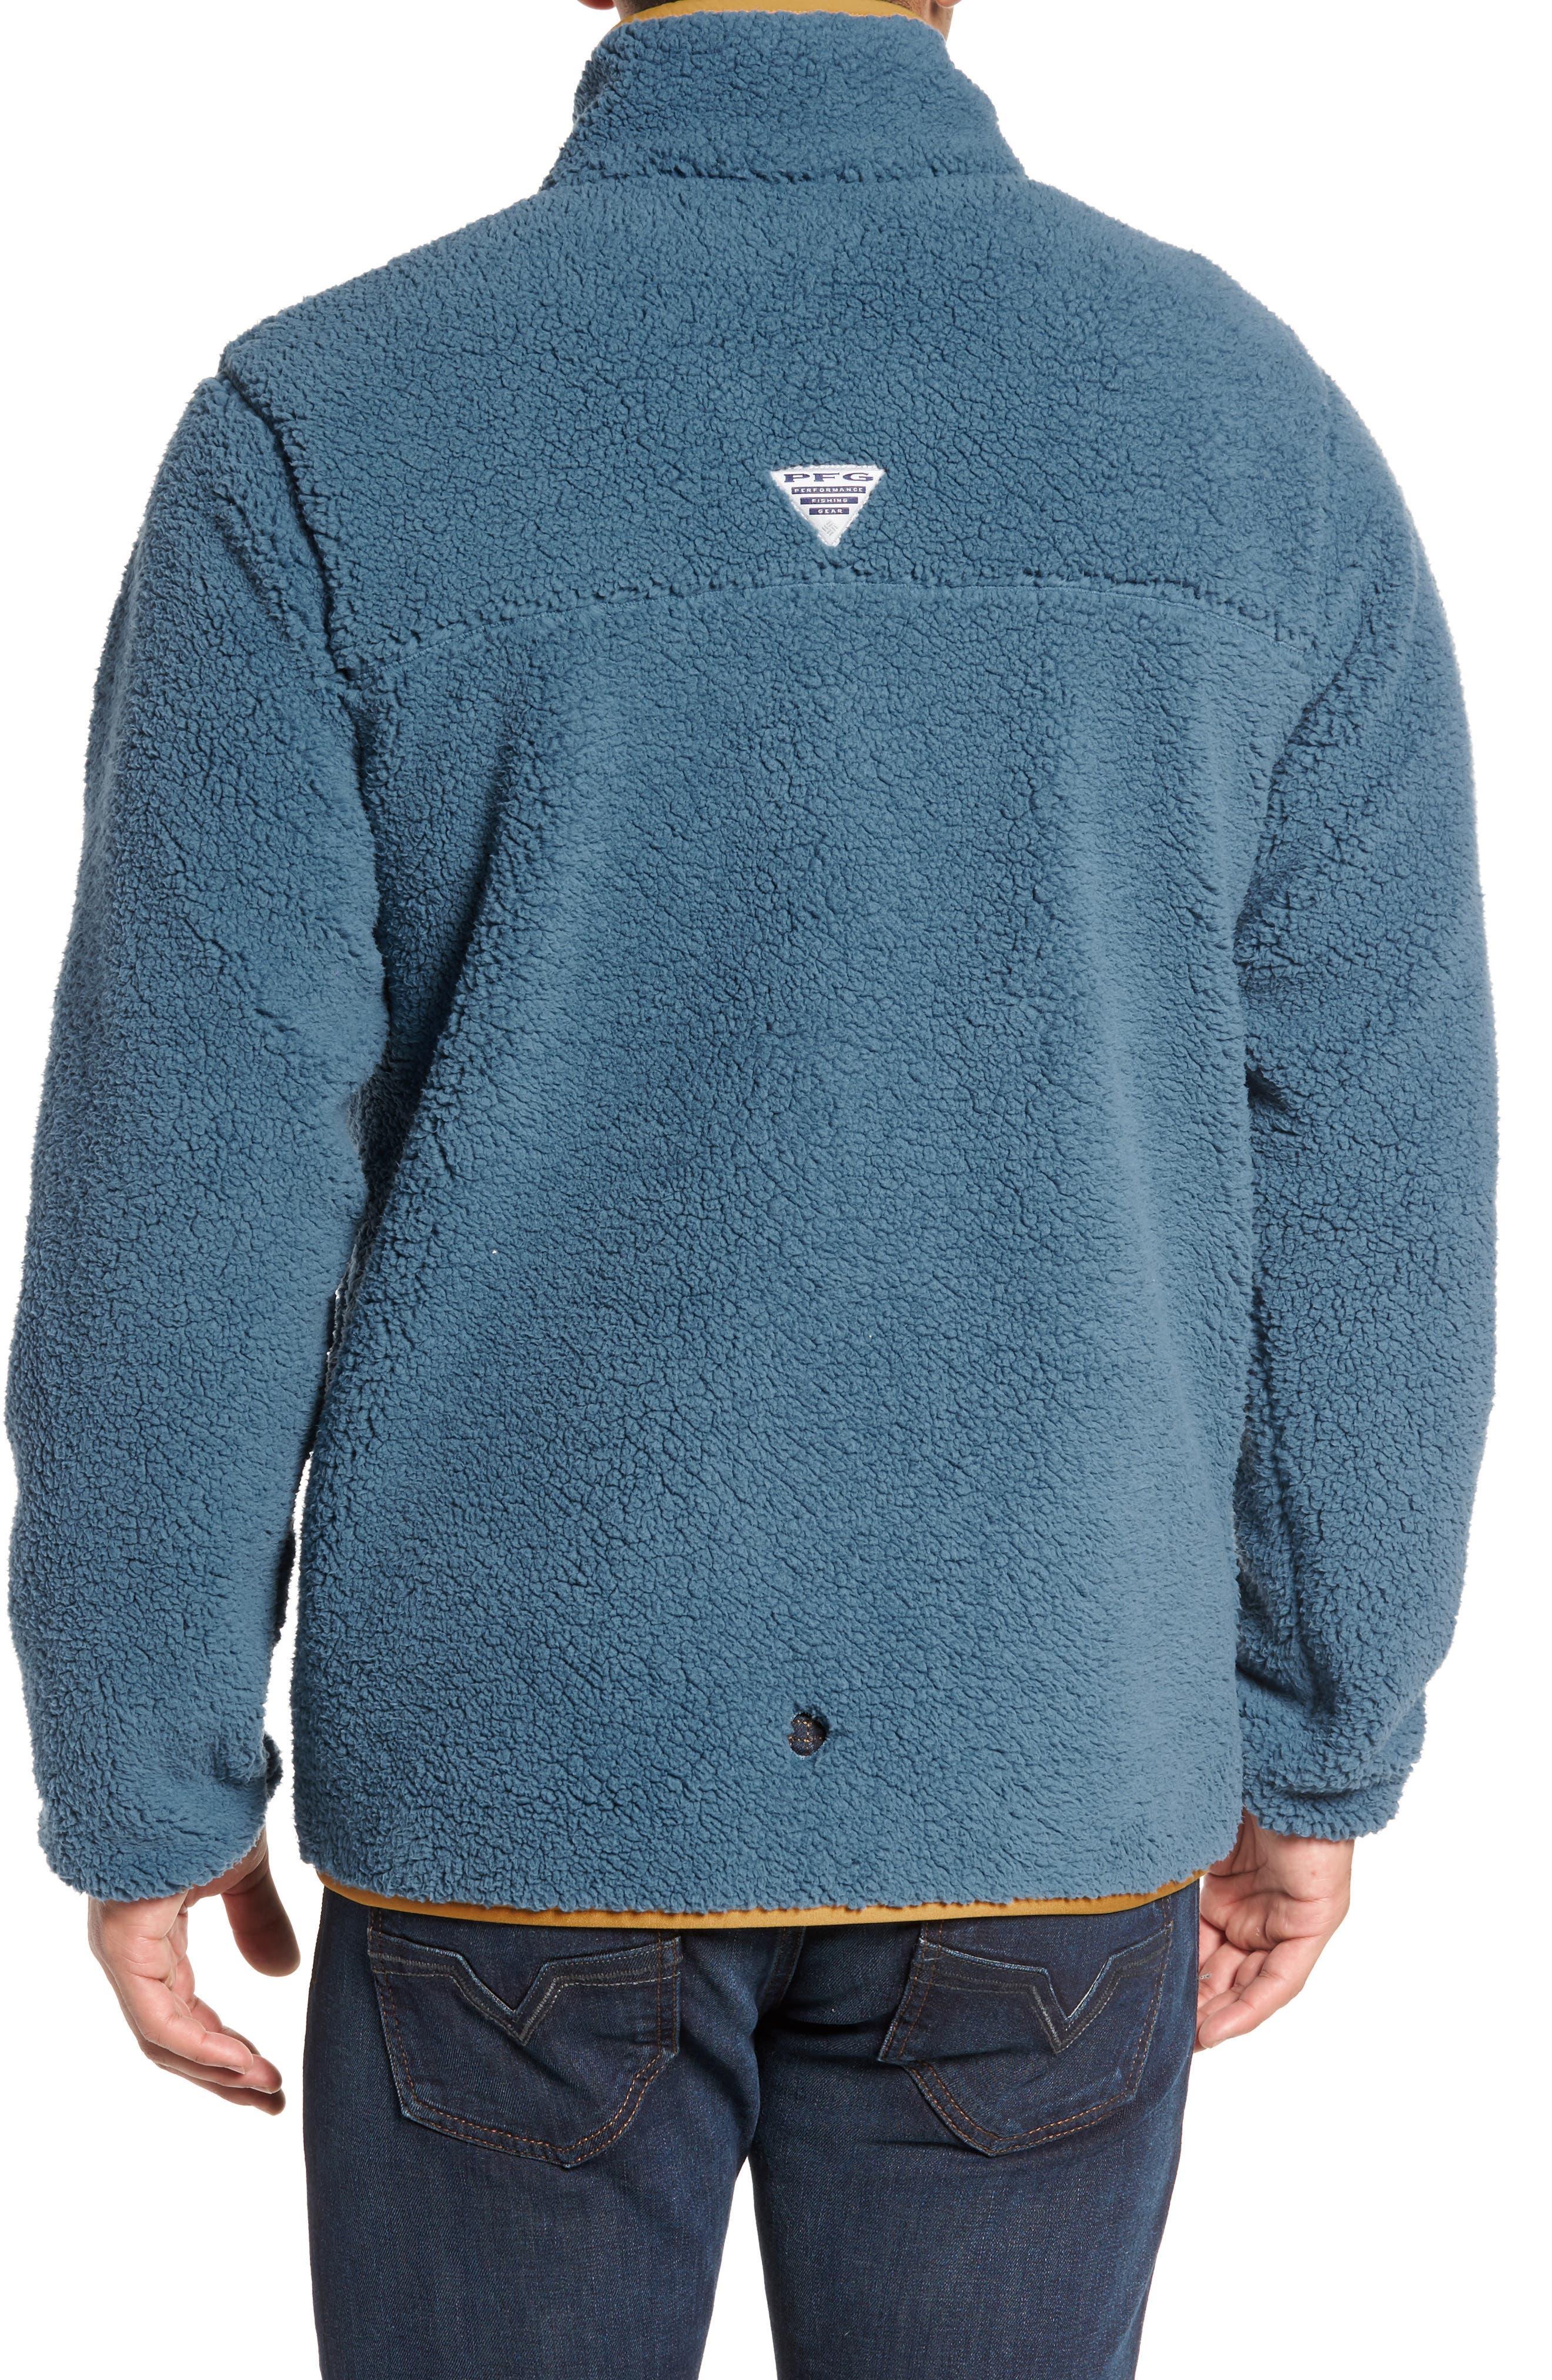 Harborside Fleece Jacket,                             Alternate thumbnail 8, color,